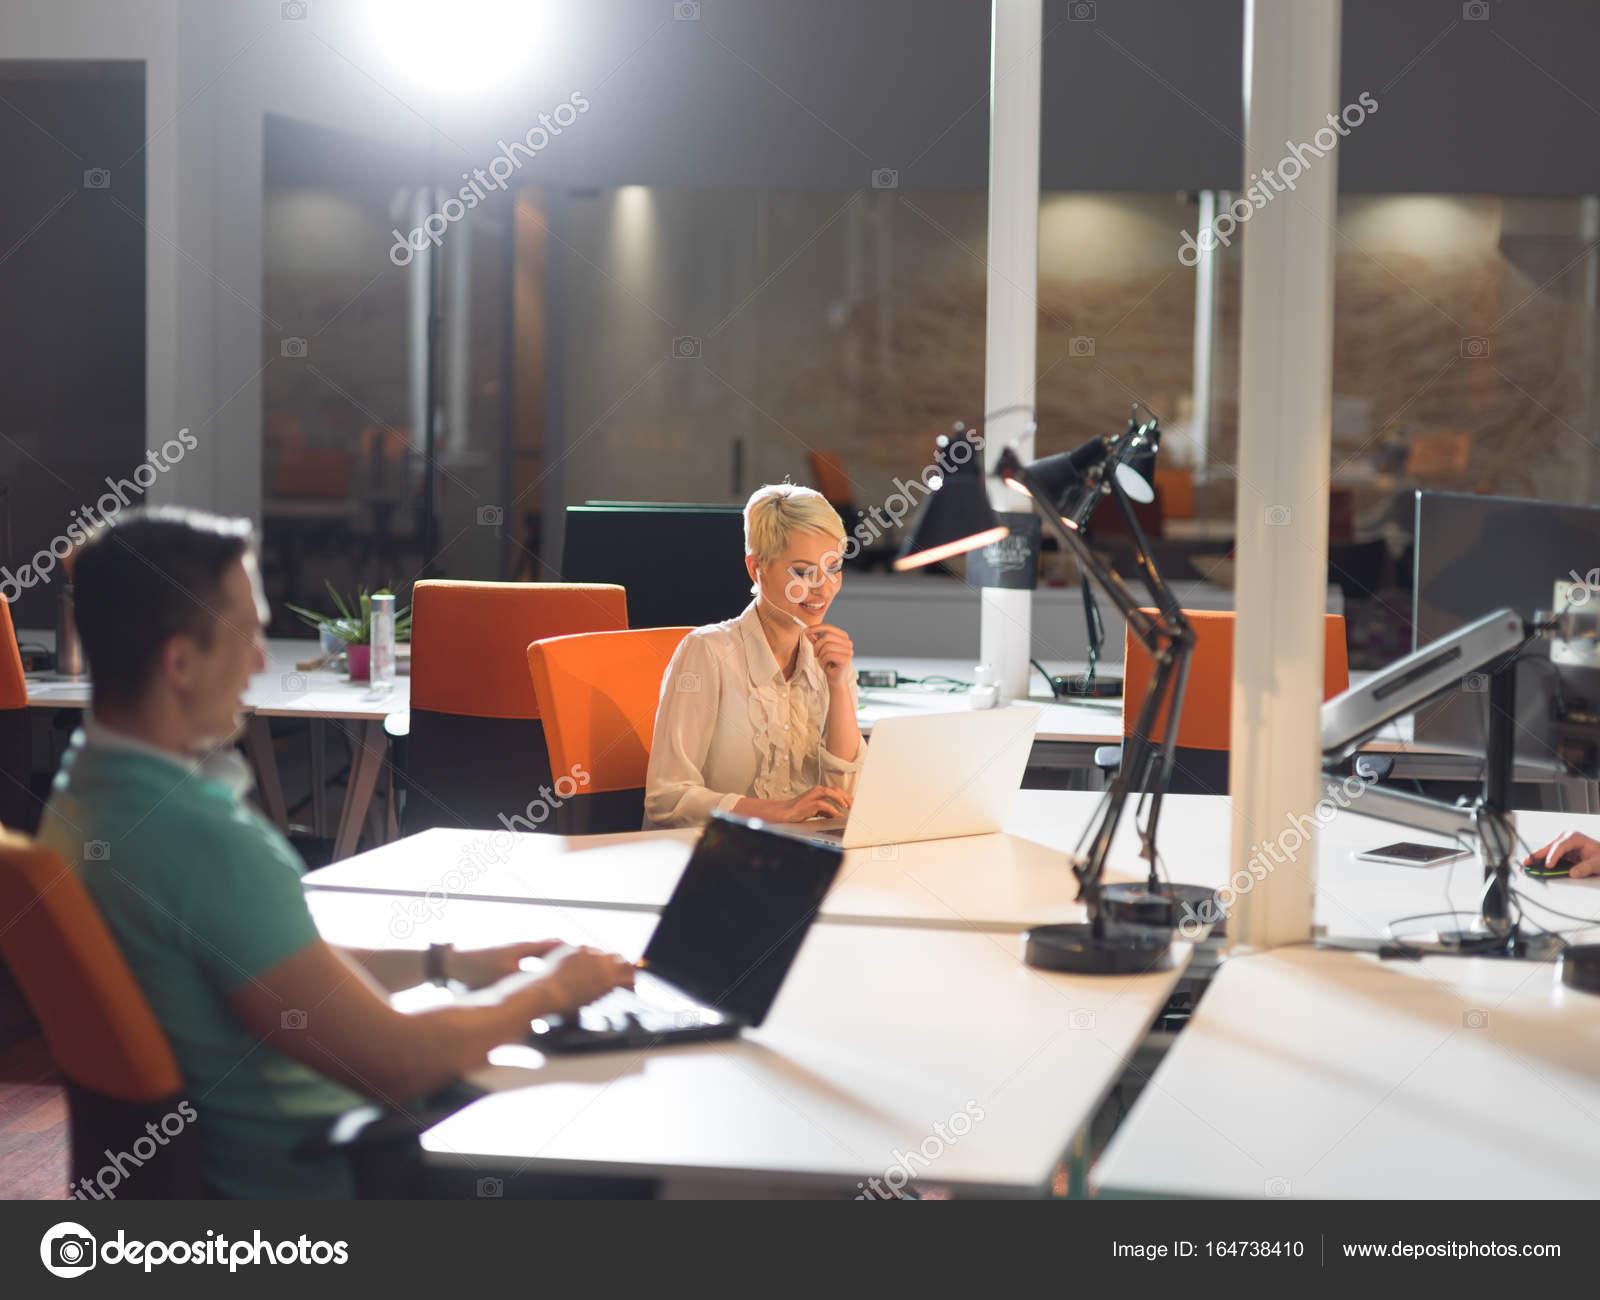 Designer im Nacht-Startup-Büro — Stockfoto © .shock #164738410